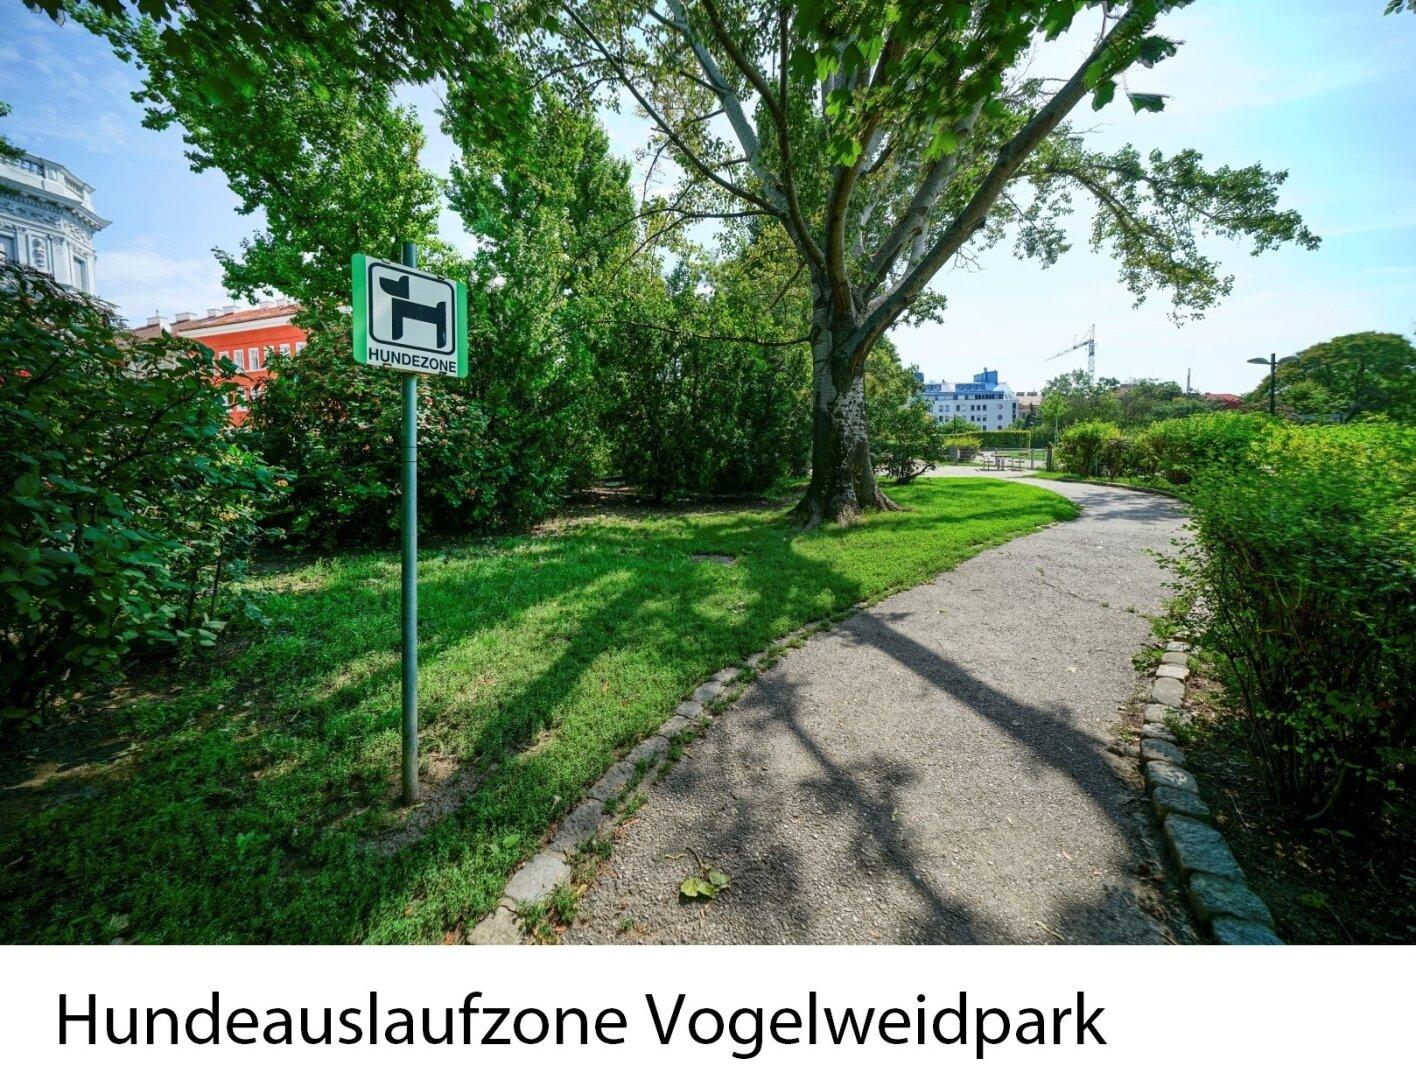 Hundeauslaufzone Vogelweidpark